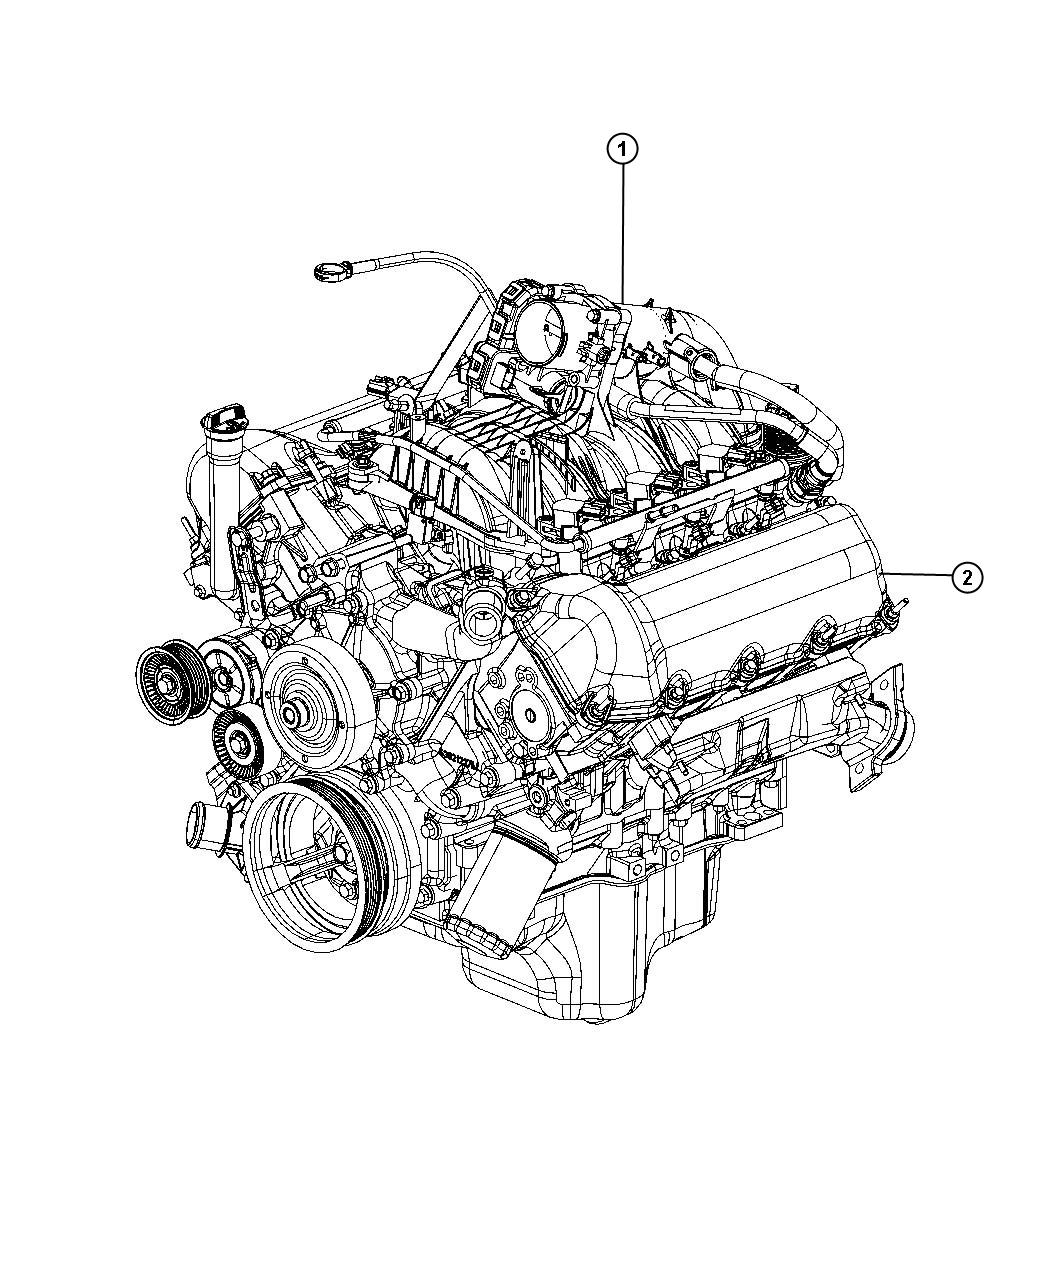 2011 Dodge Nitro Engine. Long block. Remanufactured